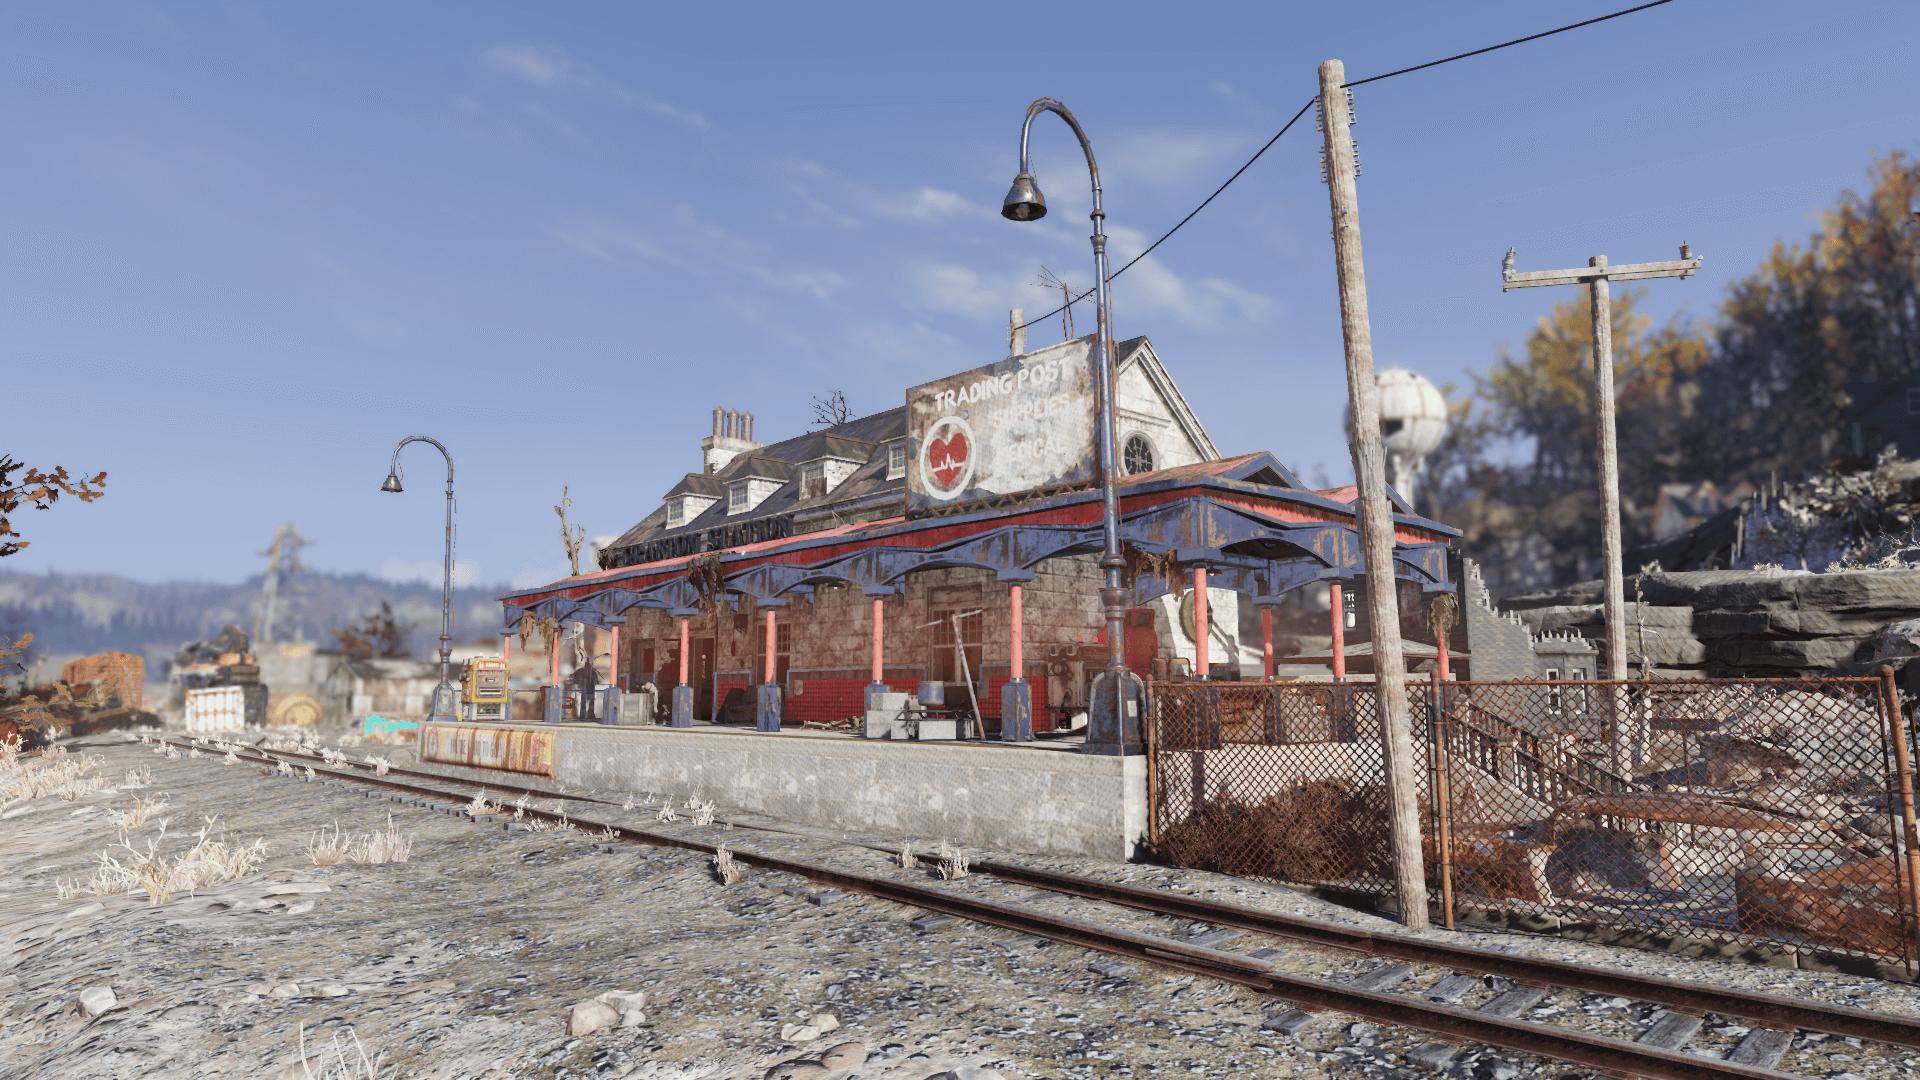 Grafton station